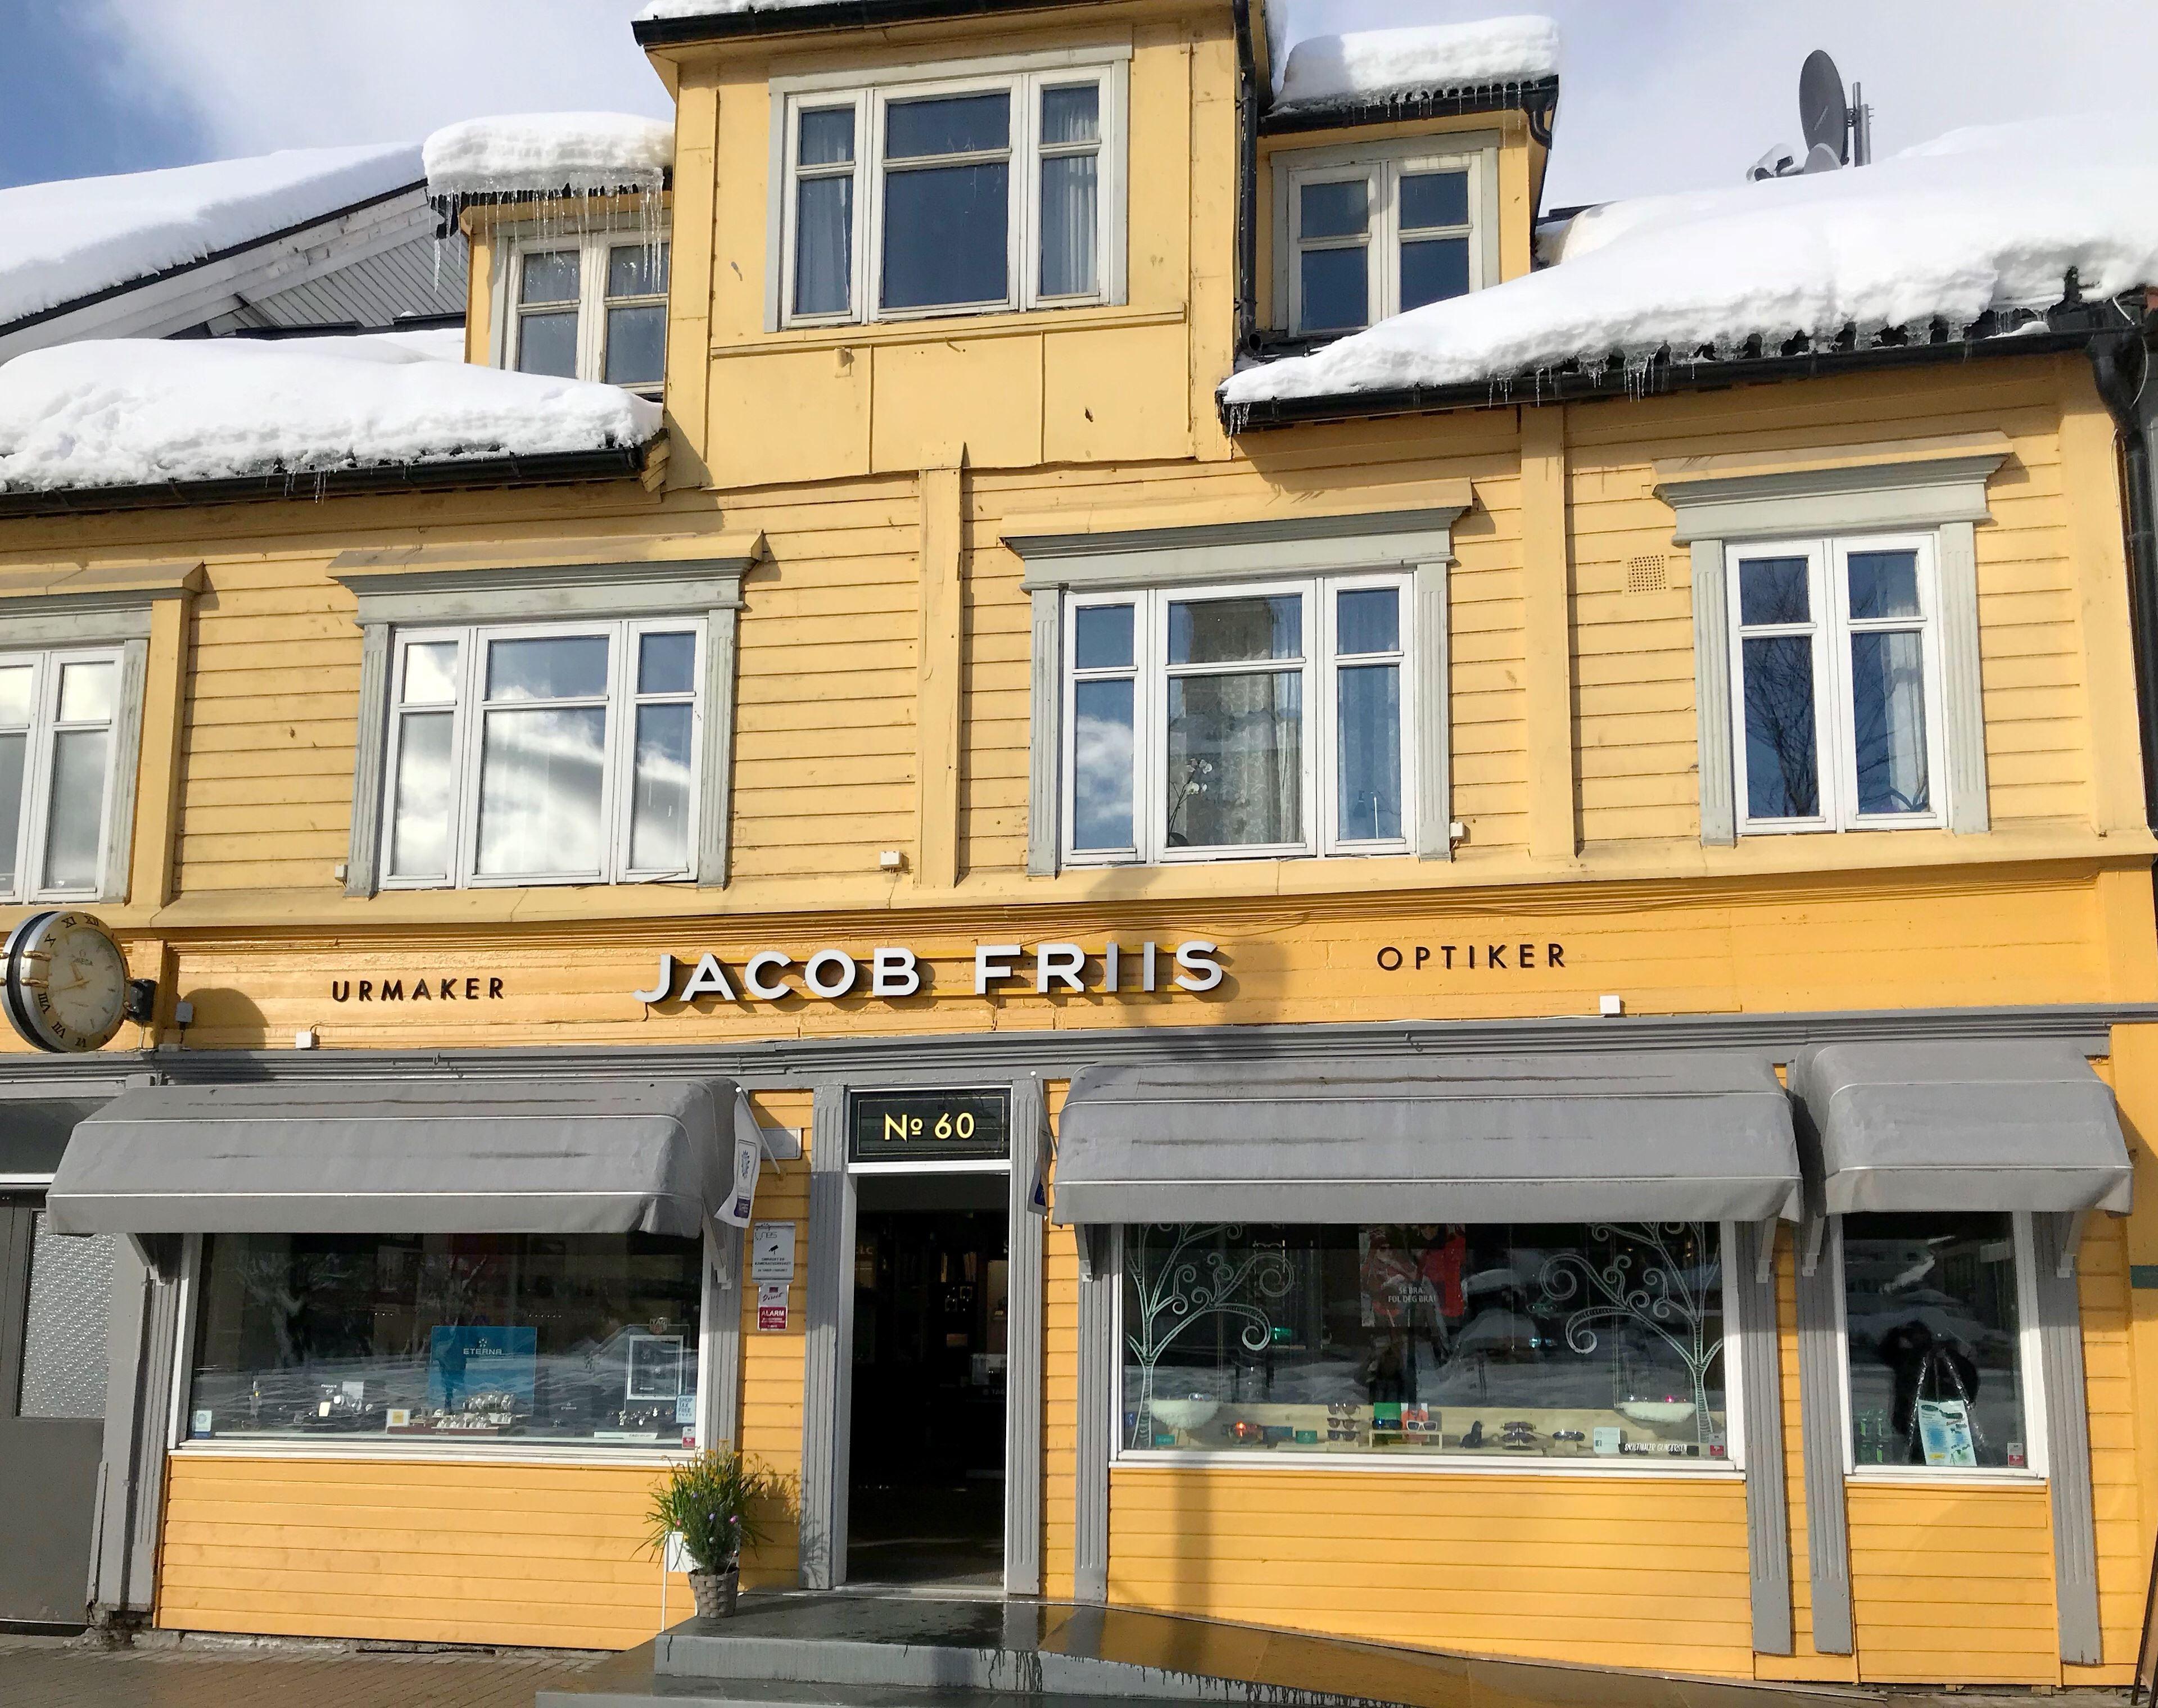 © Jacob Friis urmaker og optiker, Jakob Friis - Optician & watchmaker